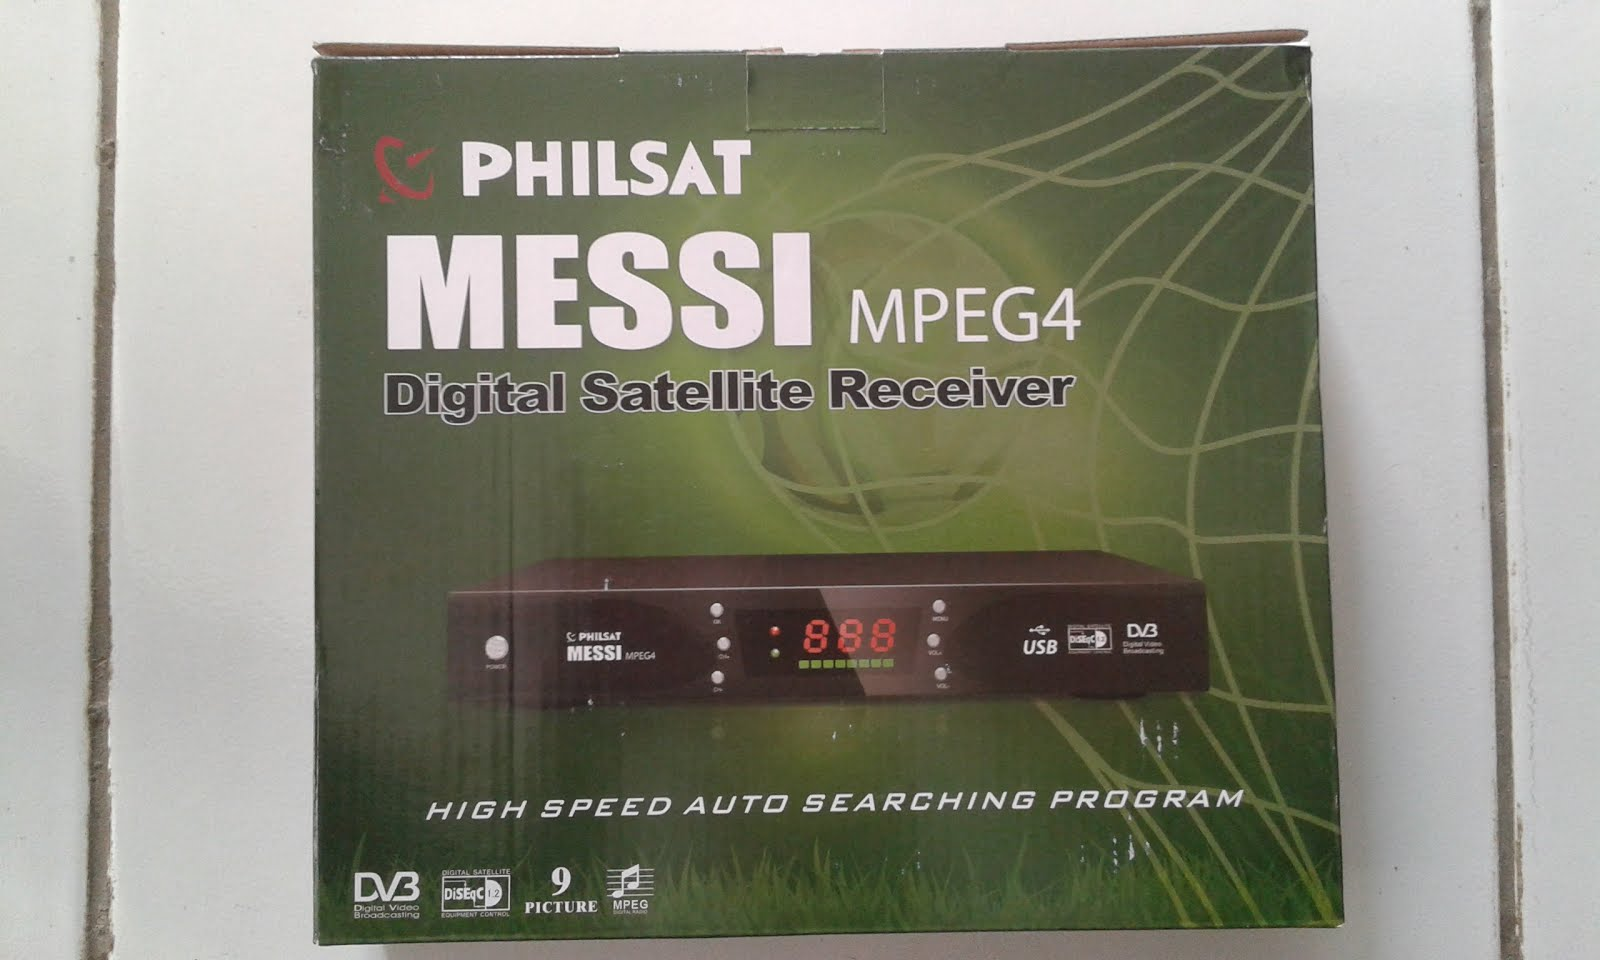 PHILSAT MESSI MPEG4